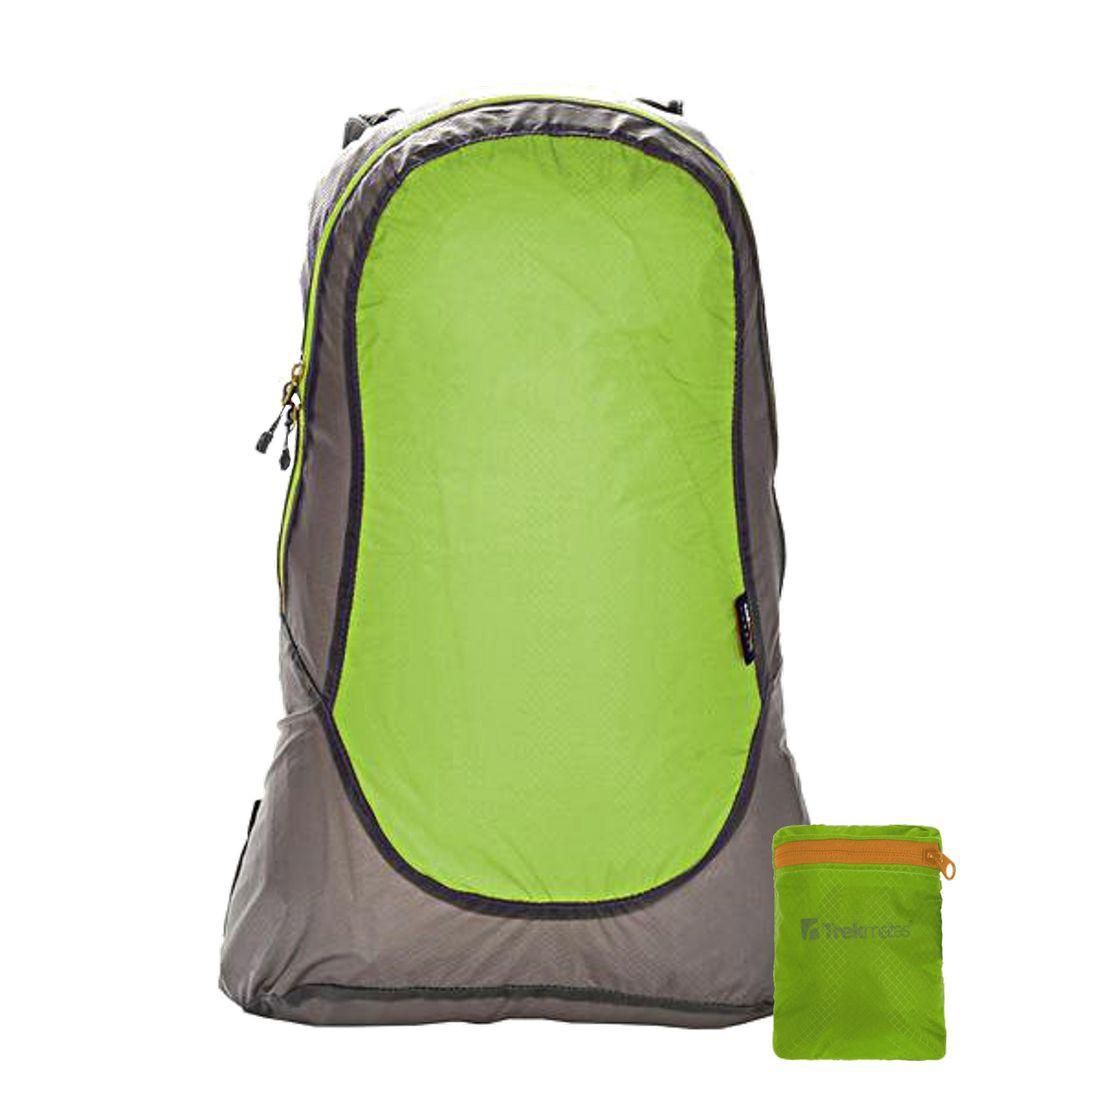 6ca9ef144717f Trekmates - Lite Daypack - leichter Tagesrucksack - 20 Liter Volumen -  Image 1